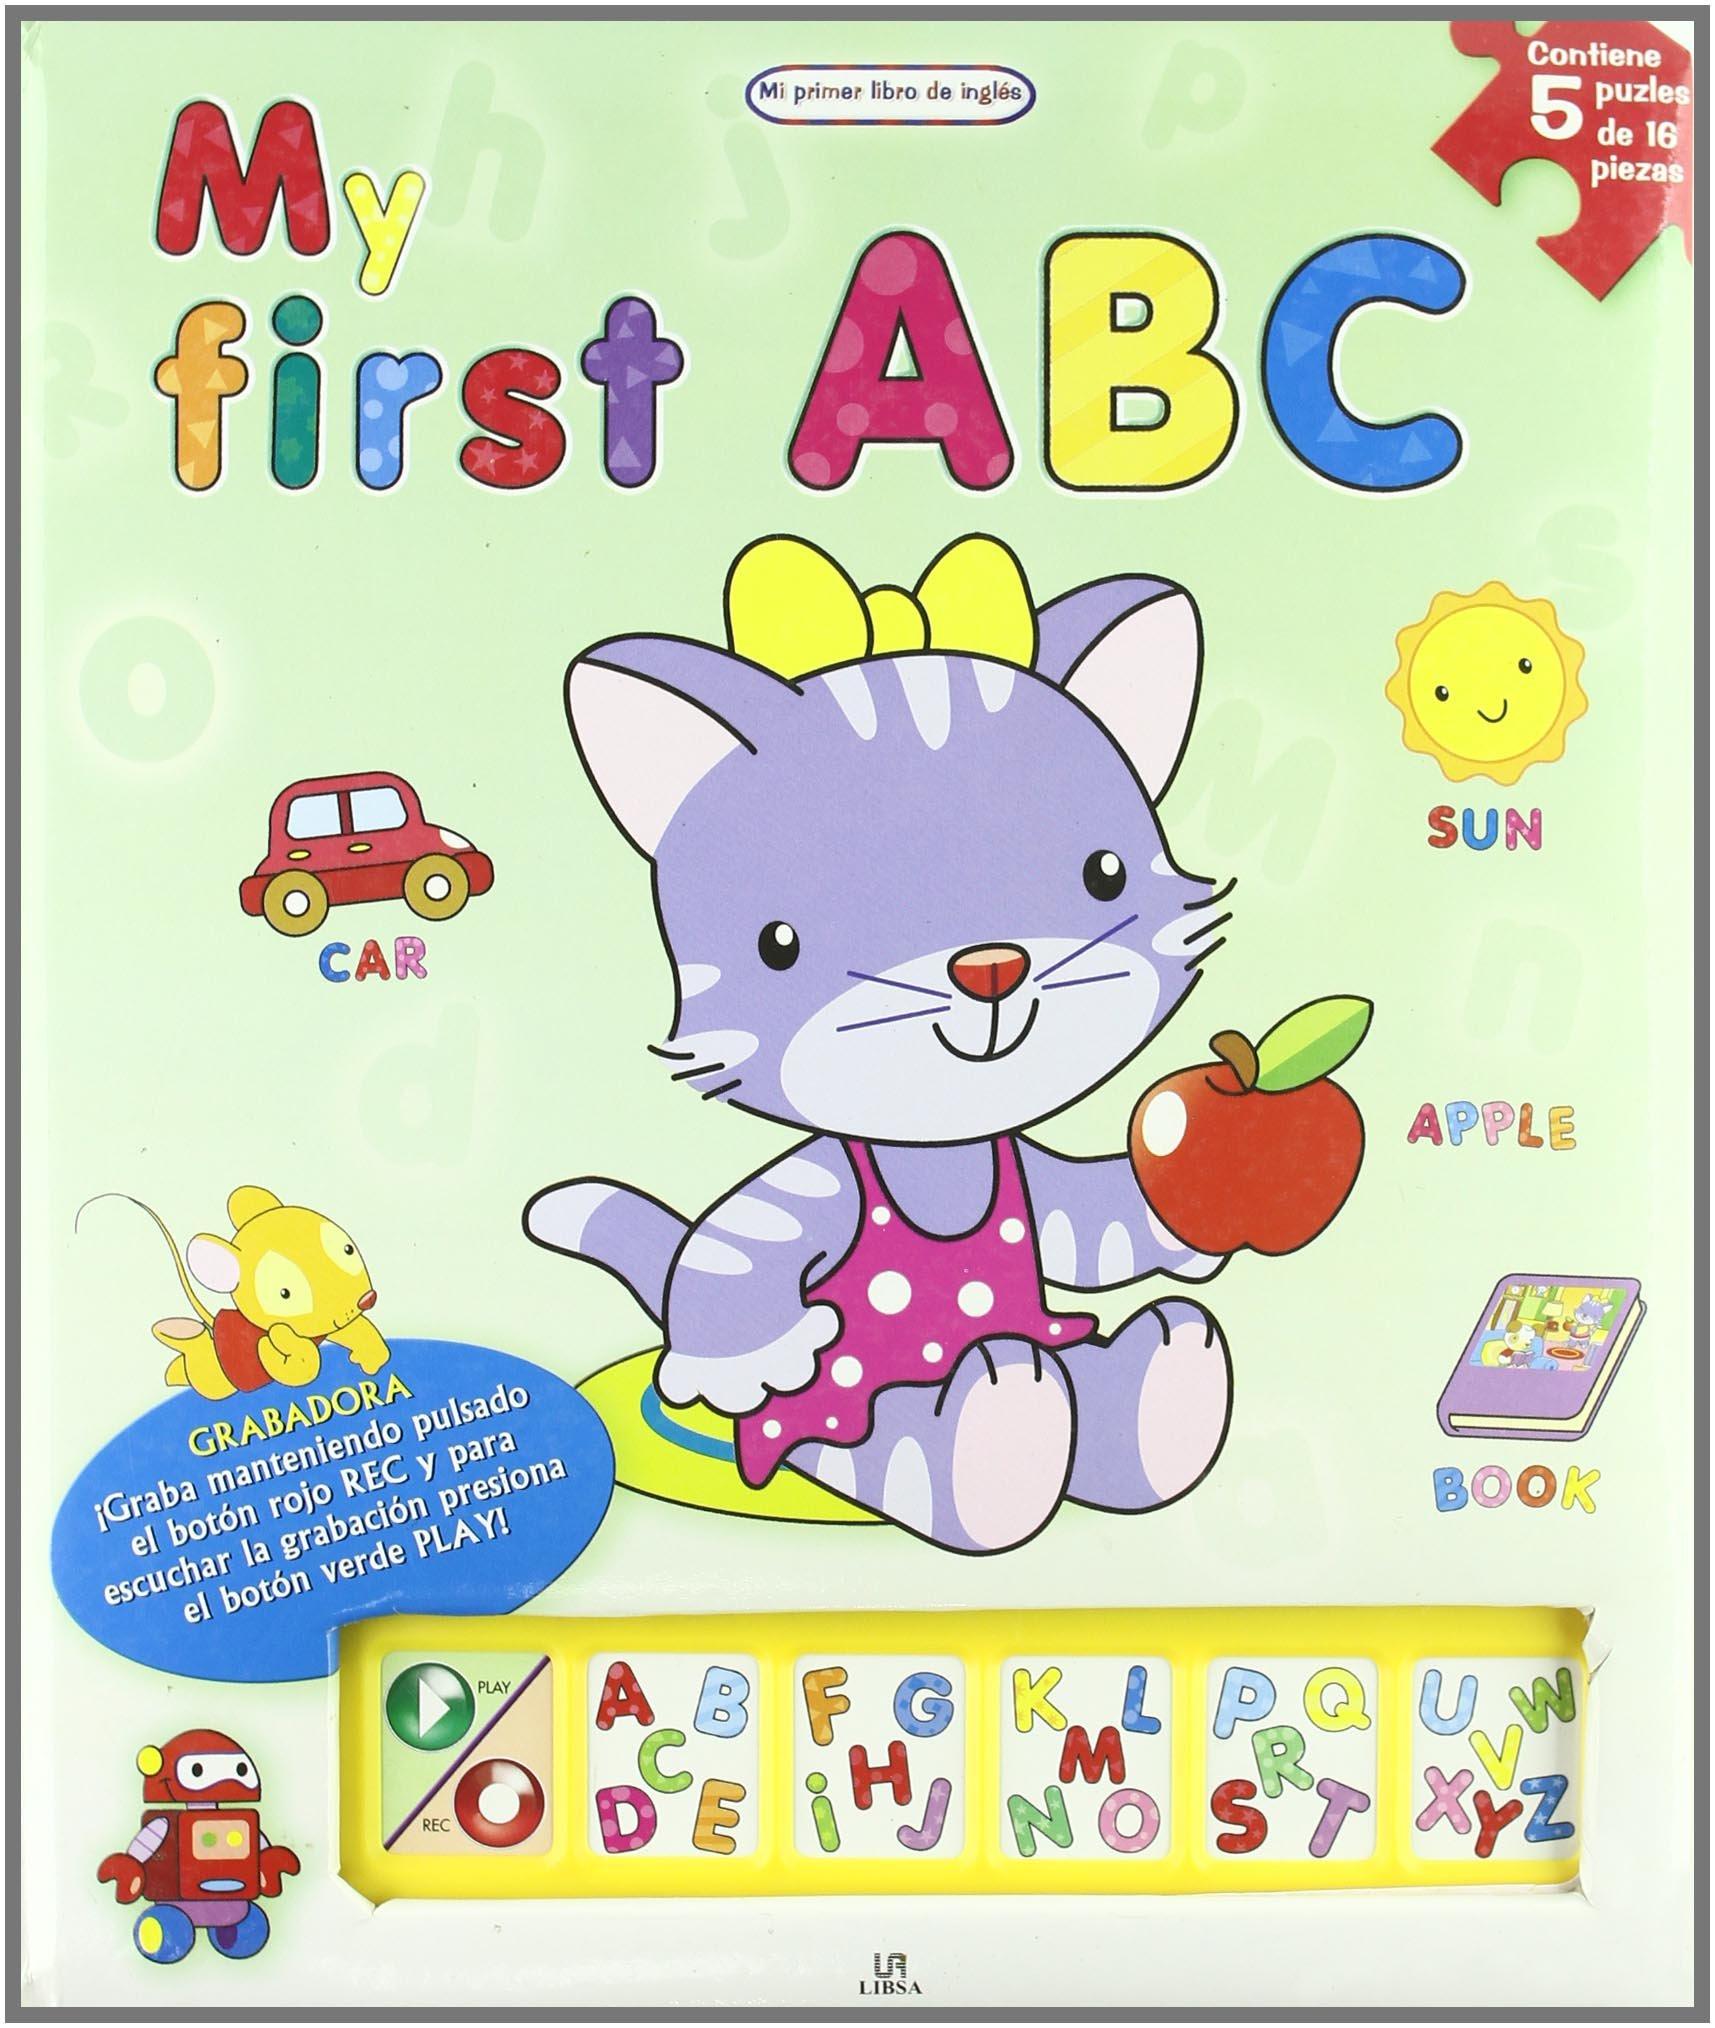 My First ABC (Mi Primer Libro De Ingles/ My First English Book) (Spanish Edition)